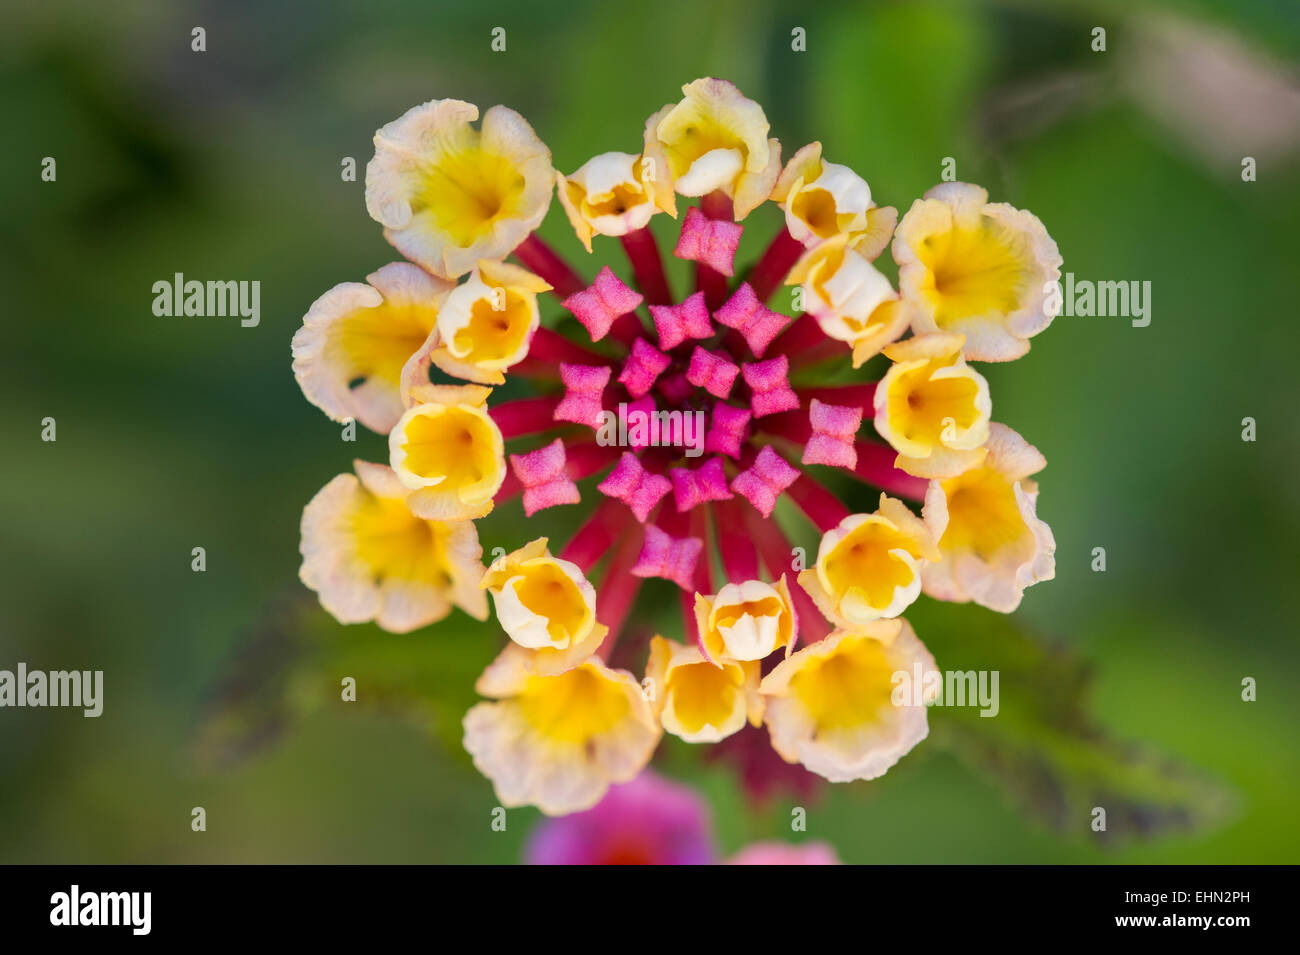 A Pink And Yellow Lantana Flower (Lantana camara)  growing in a garden near Lachi (Latsi), Cyprus - Stock Image